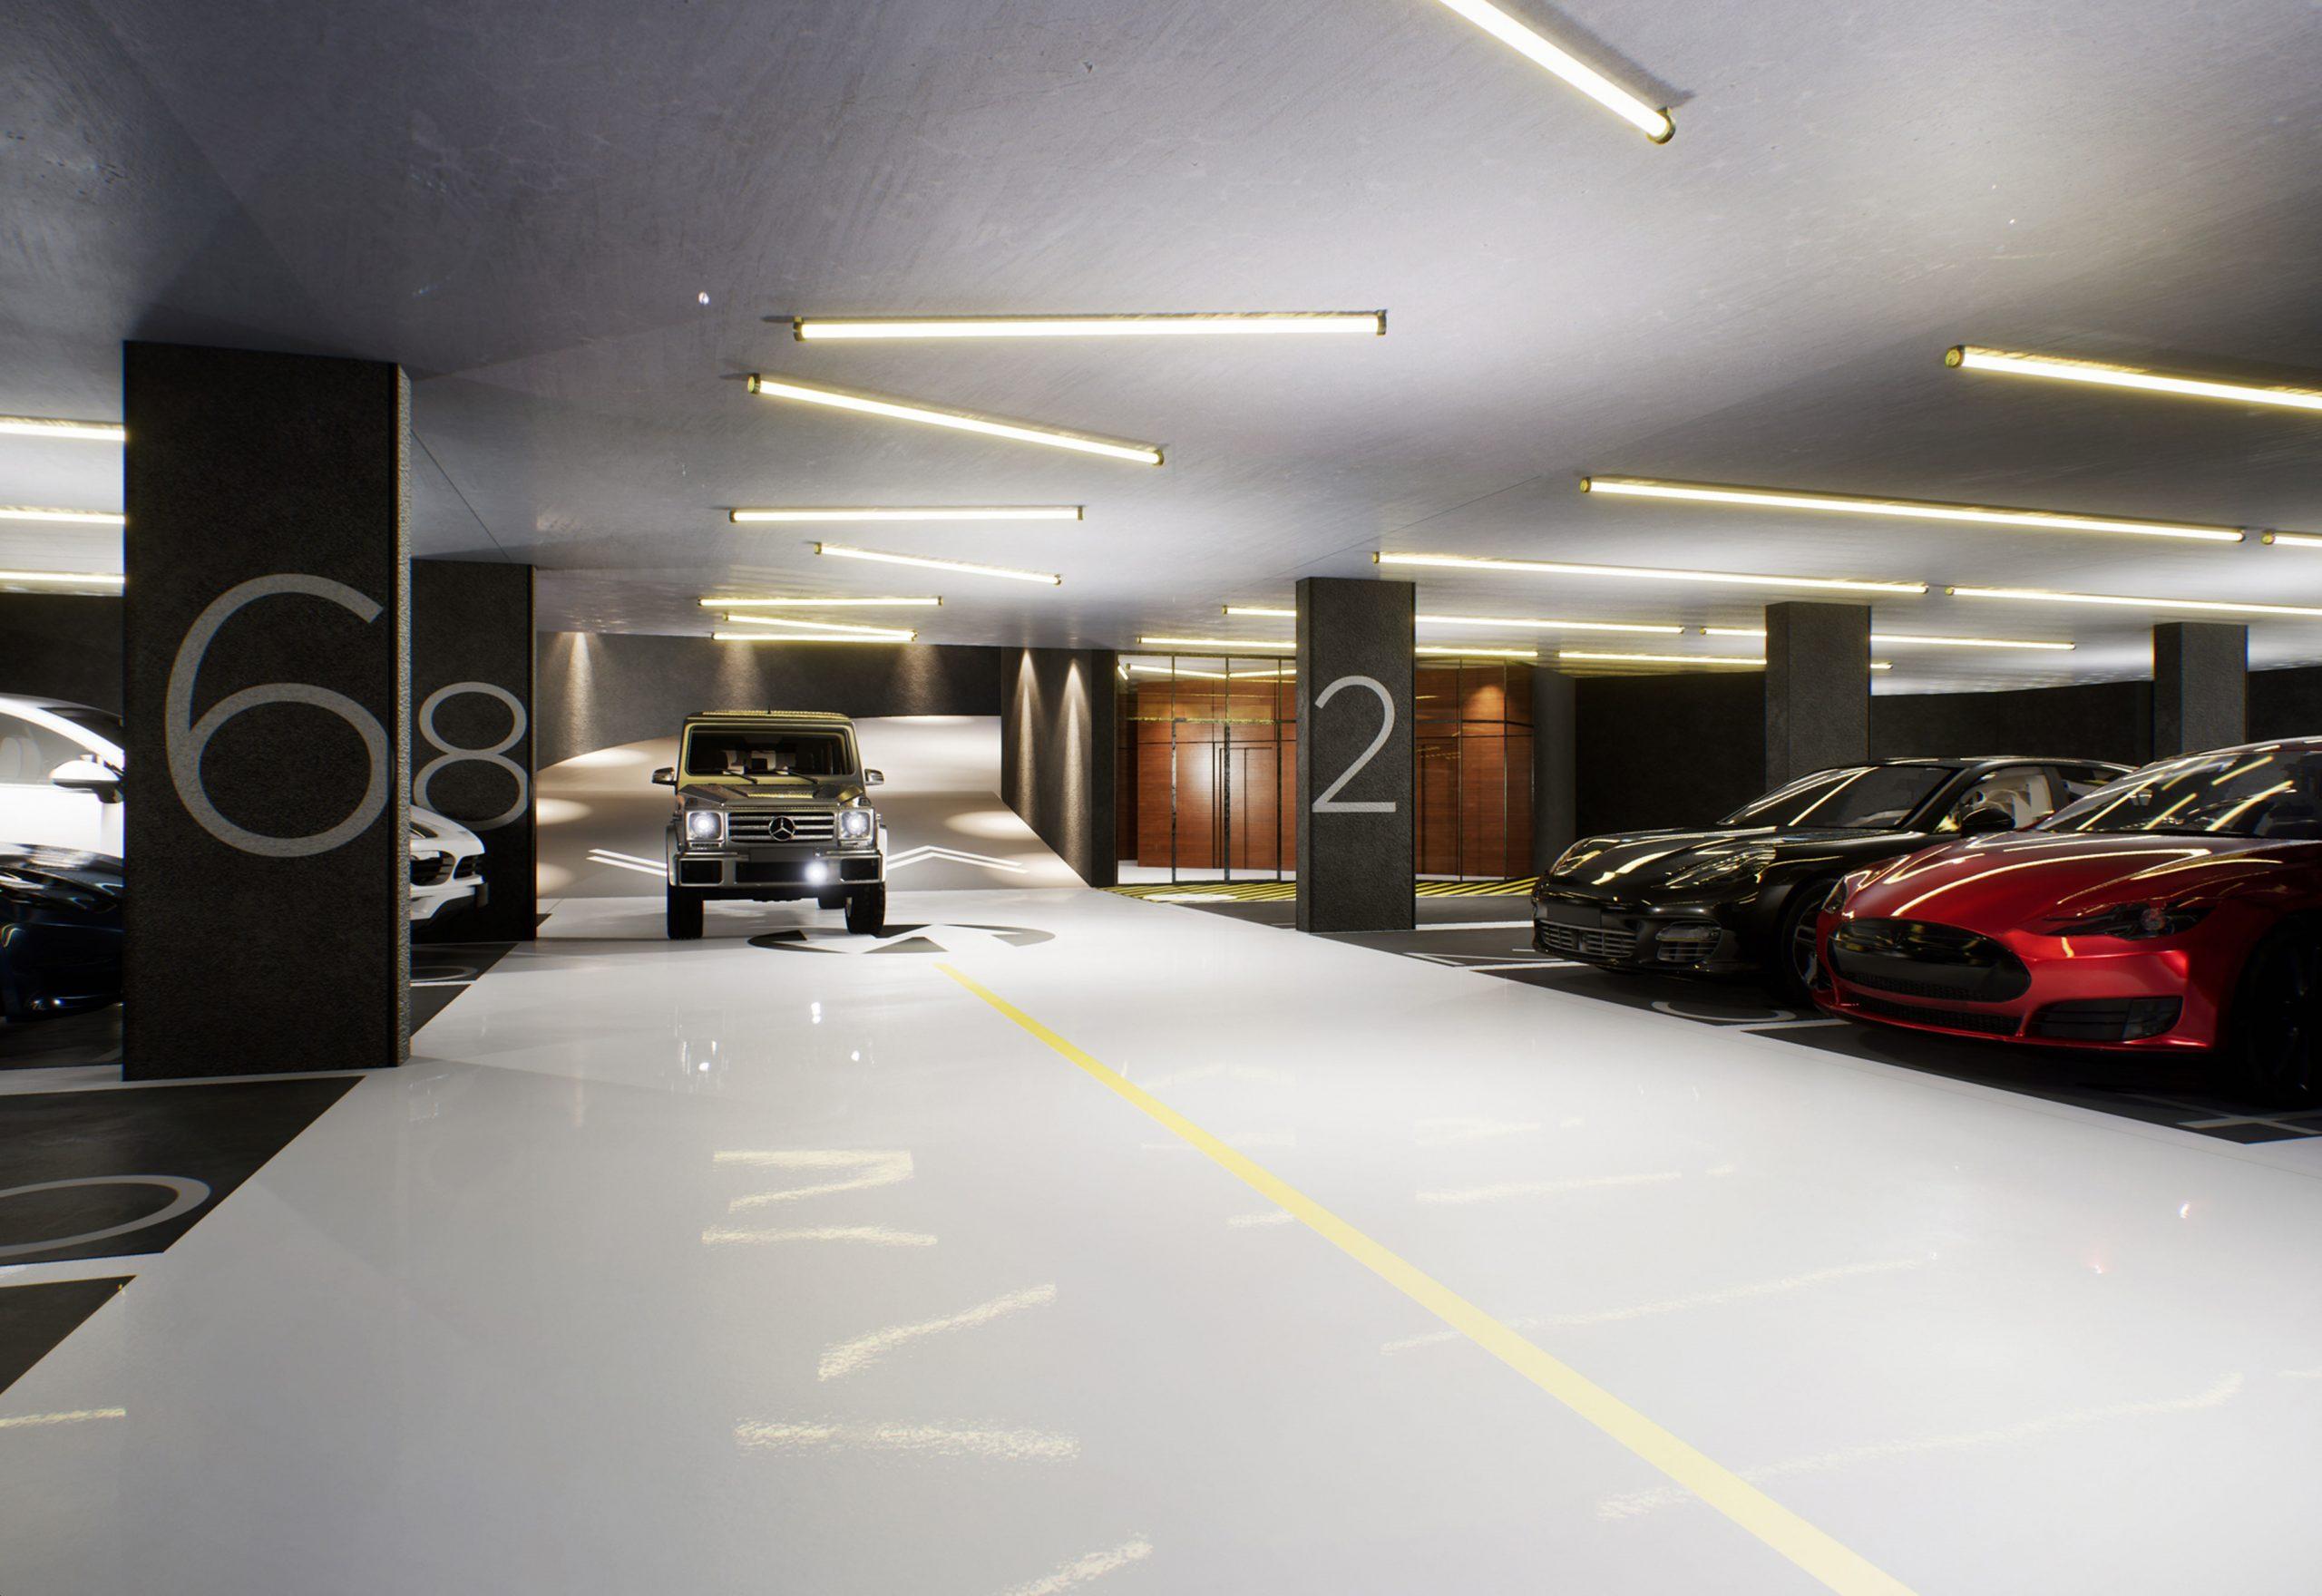 1181-Queen-West-Condos-Parking